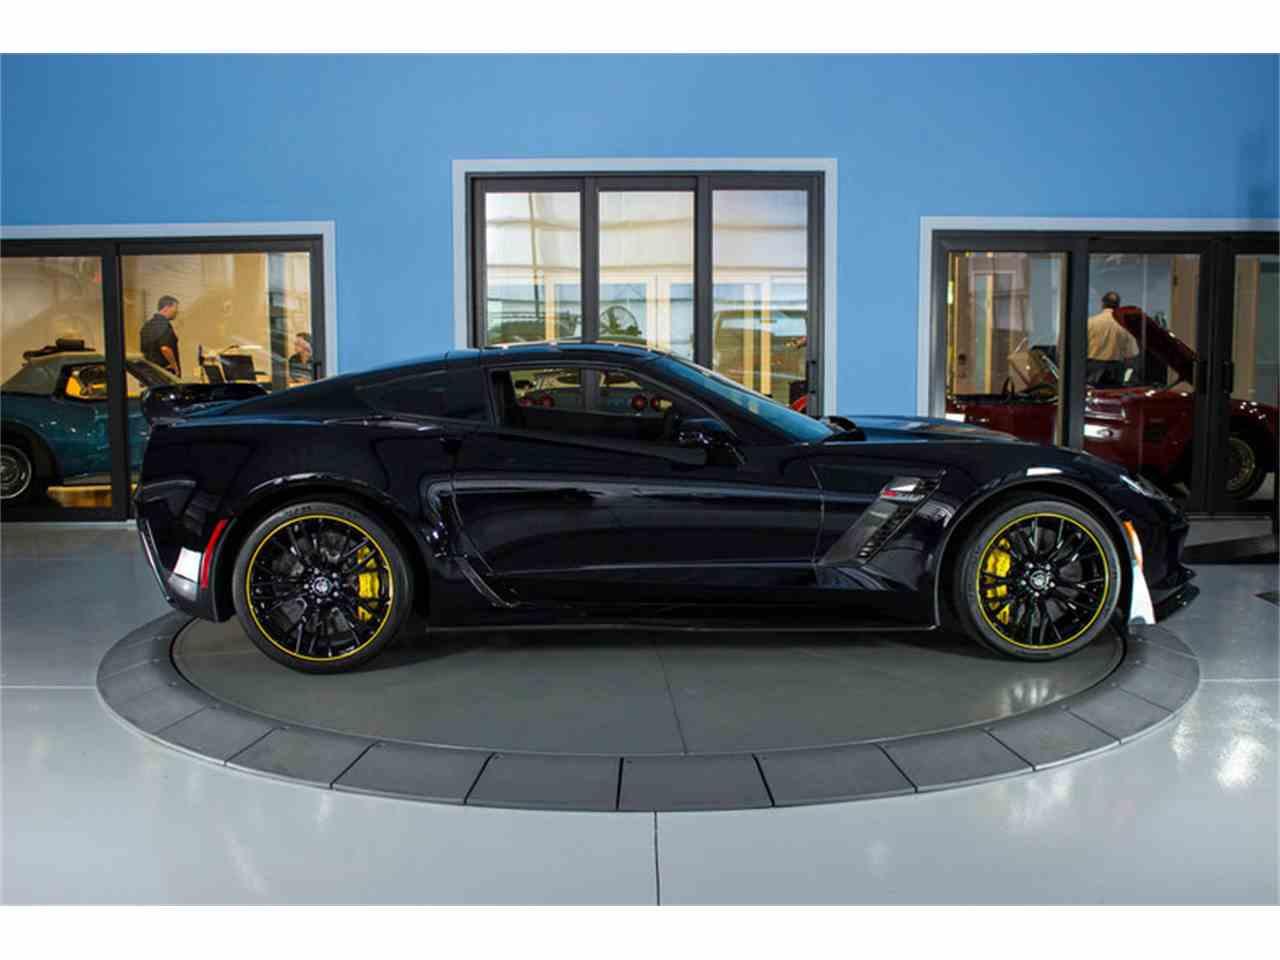 Large Picture of '16 Corvette Z06 - $99,997.00 - M7FW